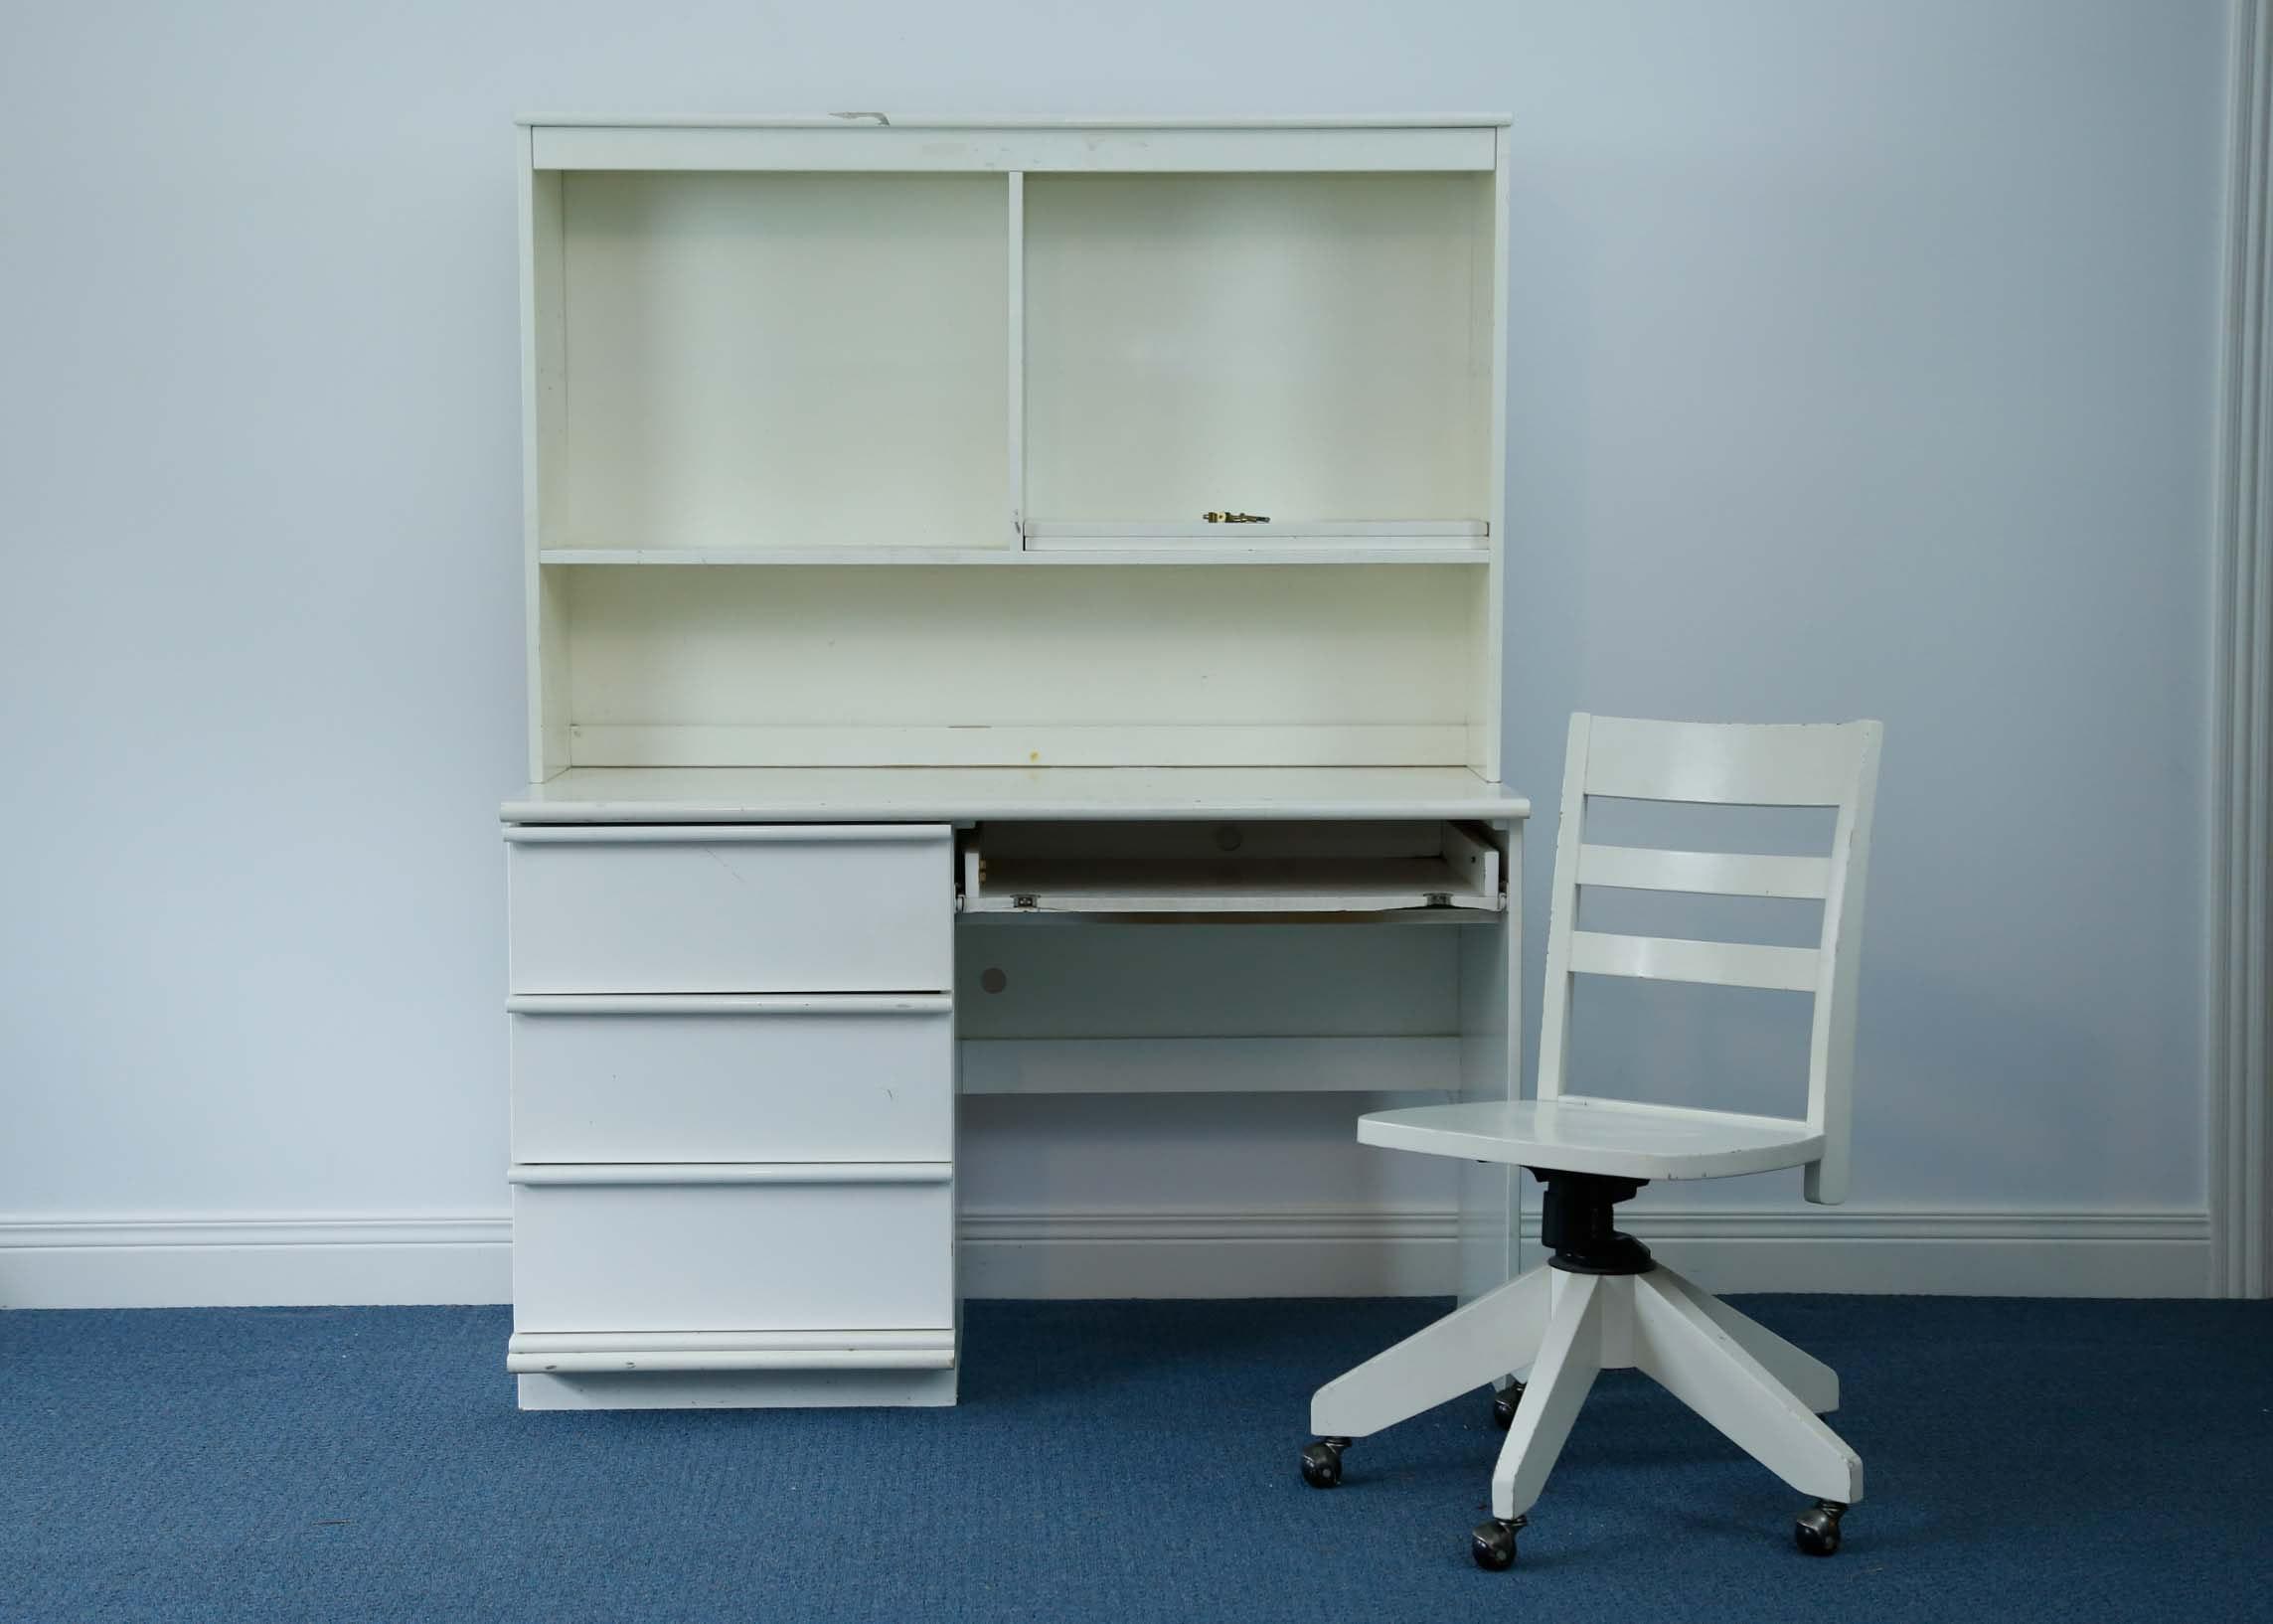 Pottery Barn White Laminate Hutch Desk and Chair EBTH